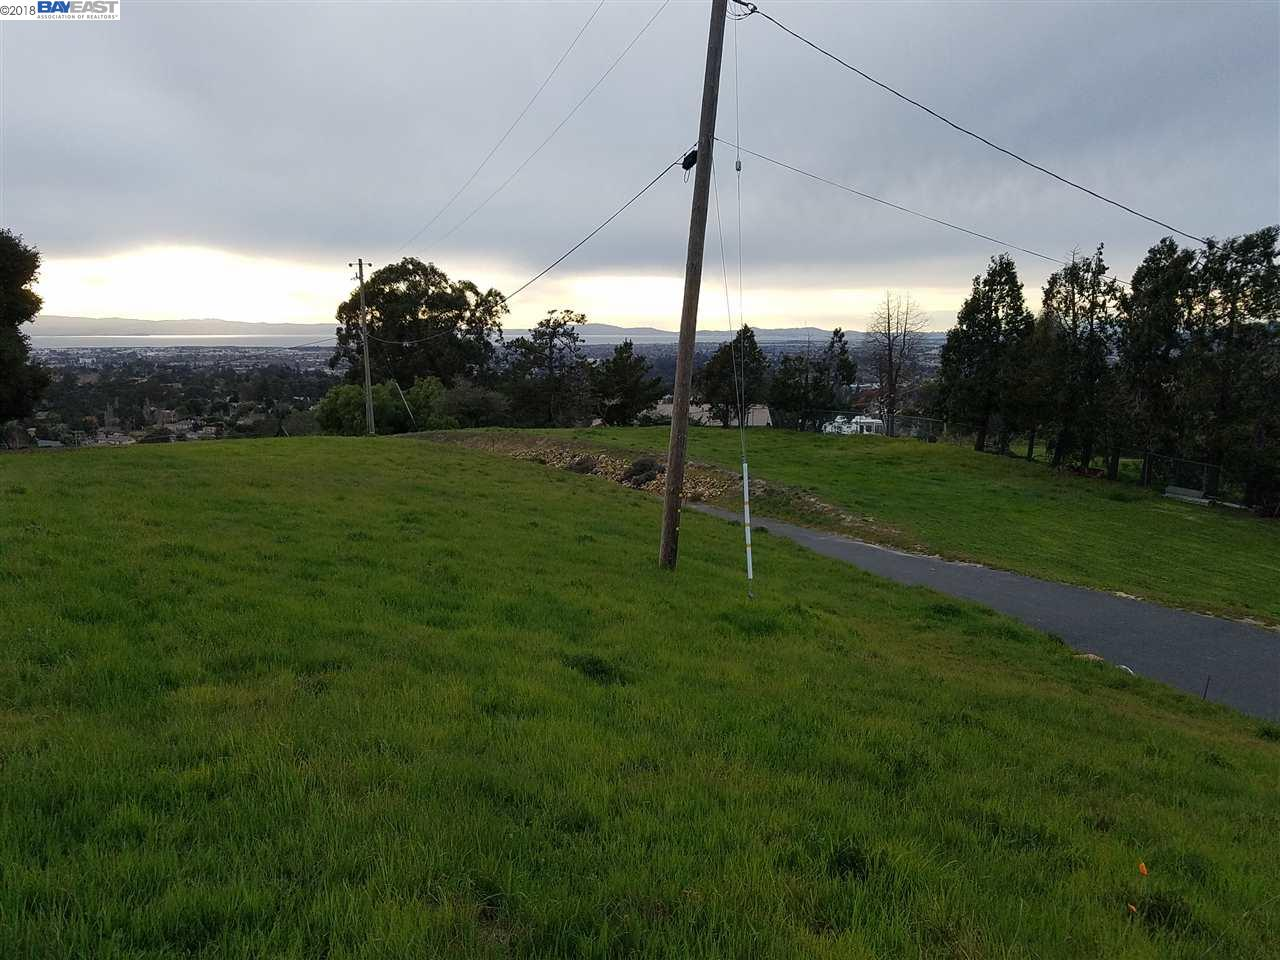 Land for Sale at Jelincic Drive Jelincic Drive Hayward, California 94542 United States